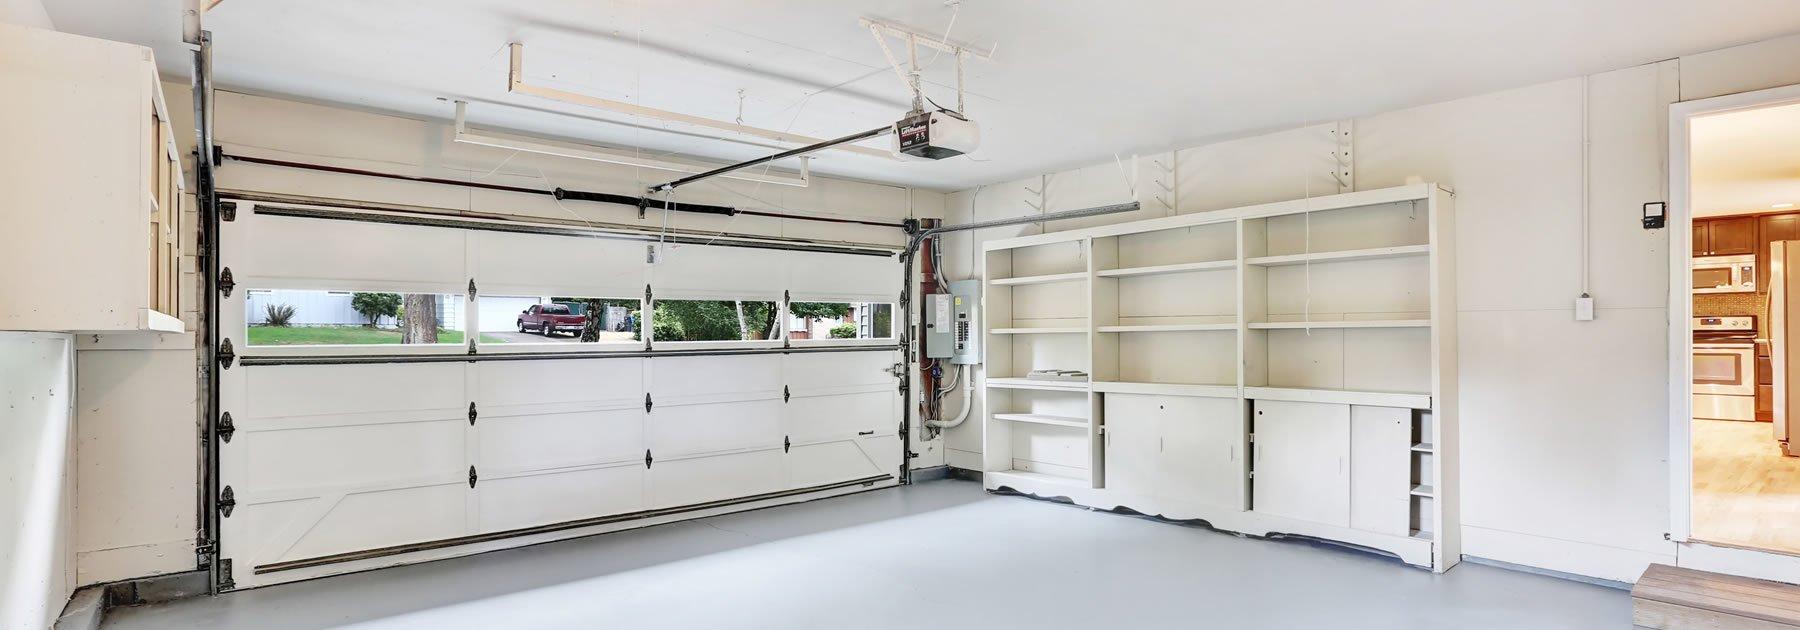 banner-converting-garage